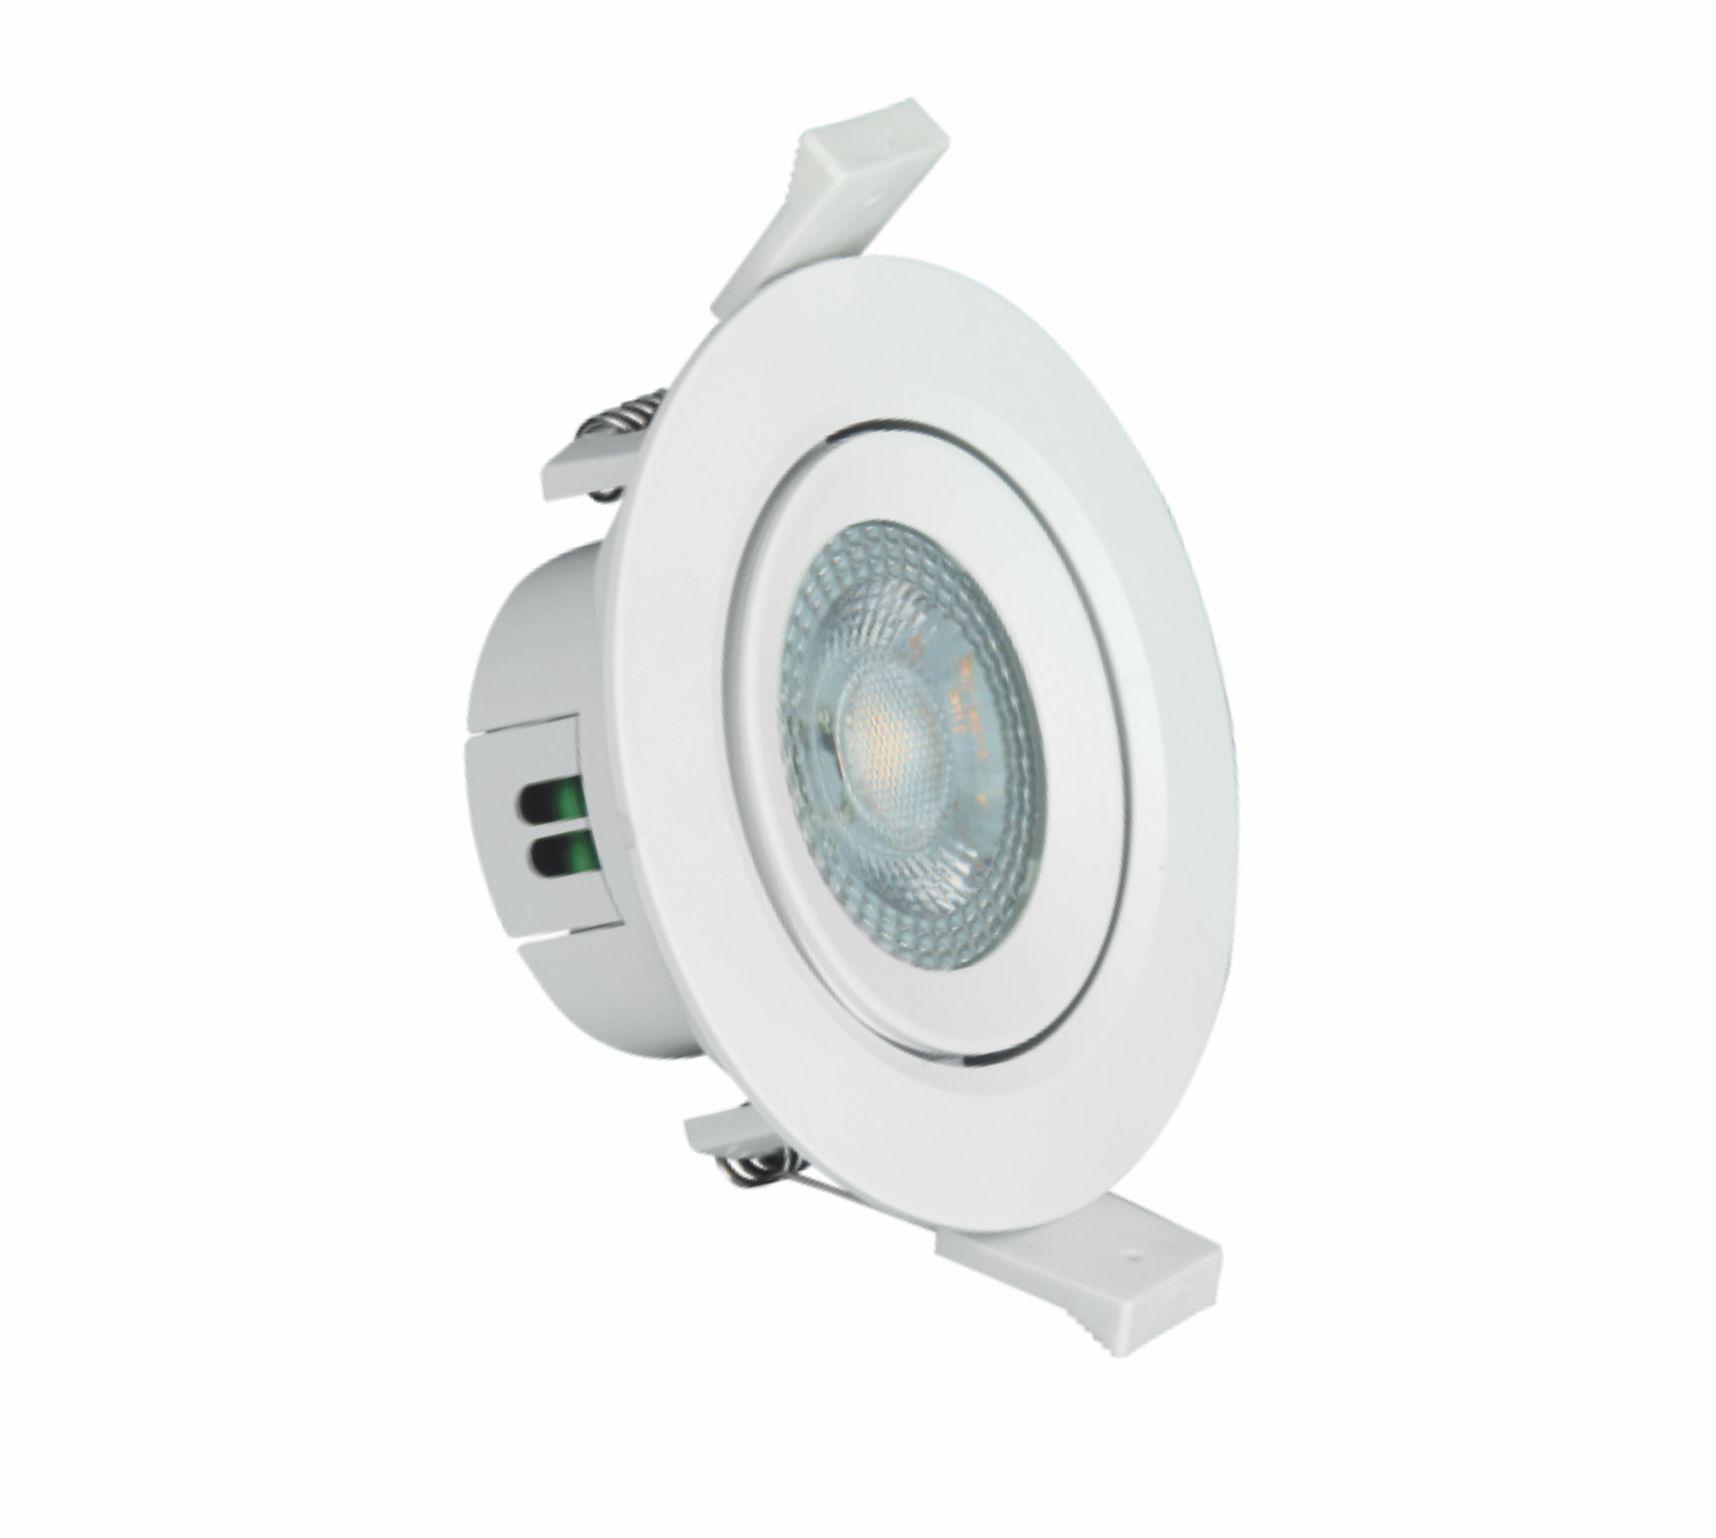 Spot LED Redondo PAR30 12W 6500K Branco AUTOVOLT